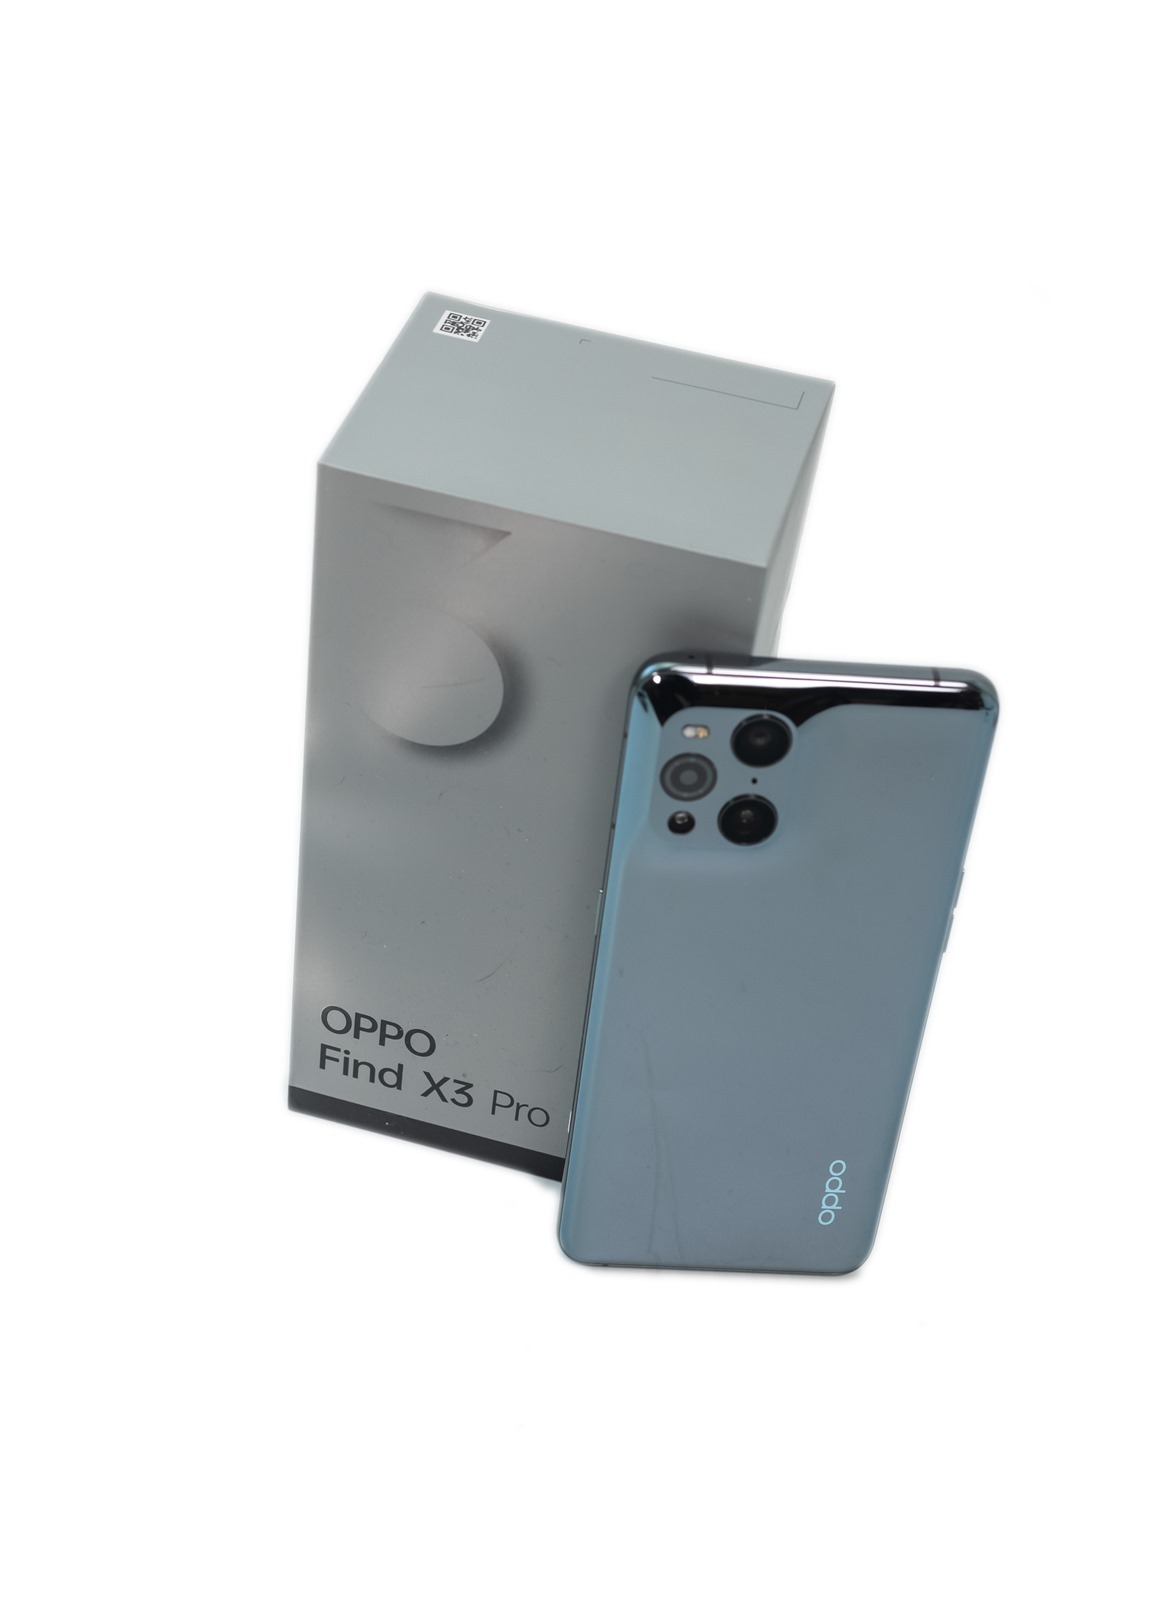 OPPO Find X3 Pro 國際版性能電力測試 / 快充實測 / 拍照分享 / 顯微鏡拍照 / 人像 / 自拍 / 沒有開箱 @3C 達人廖阿輝